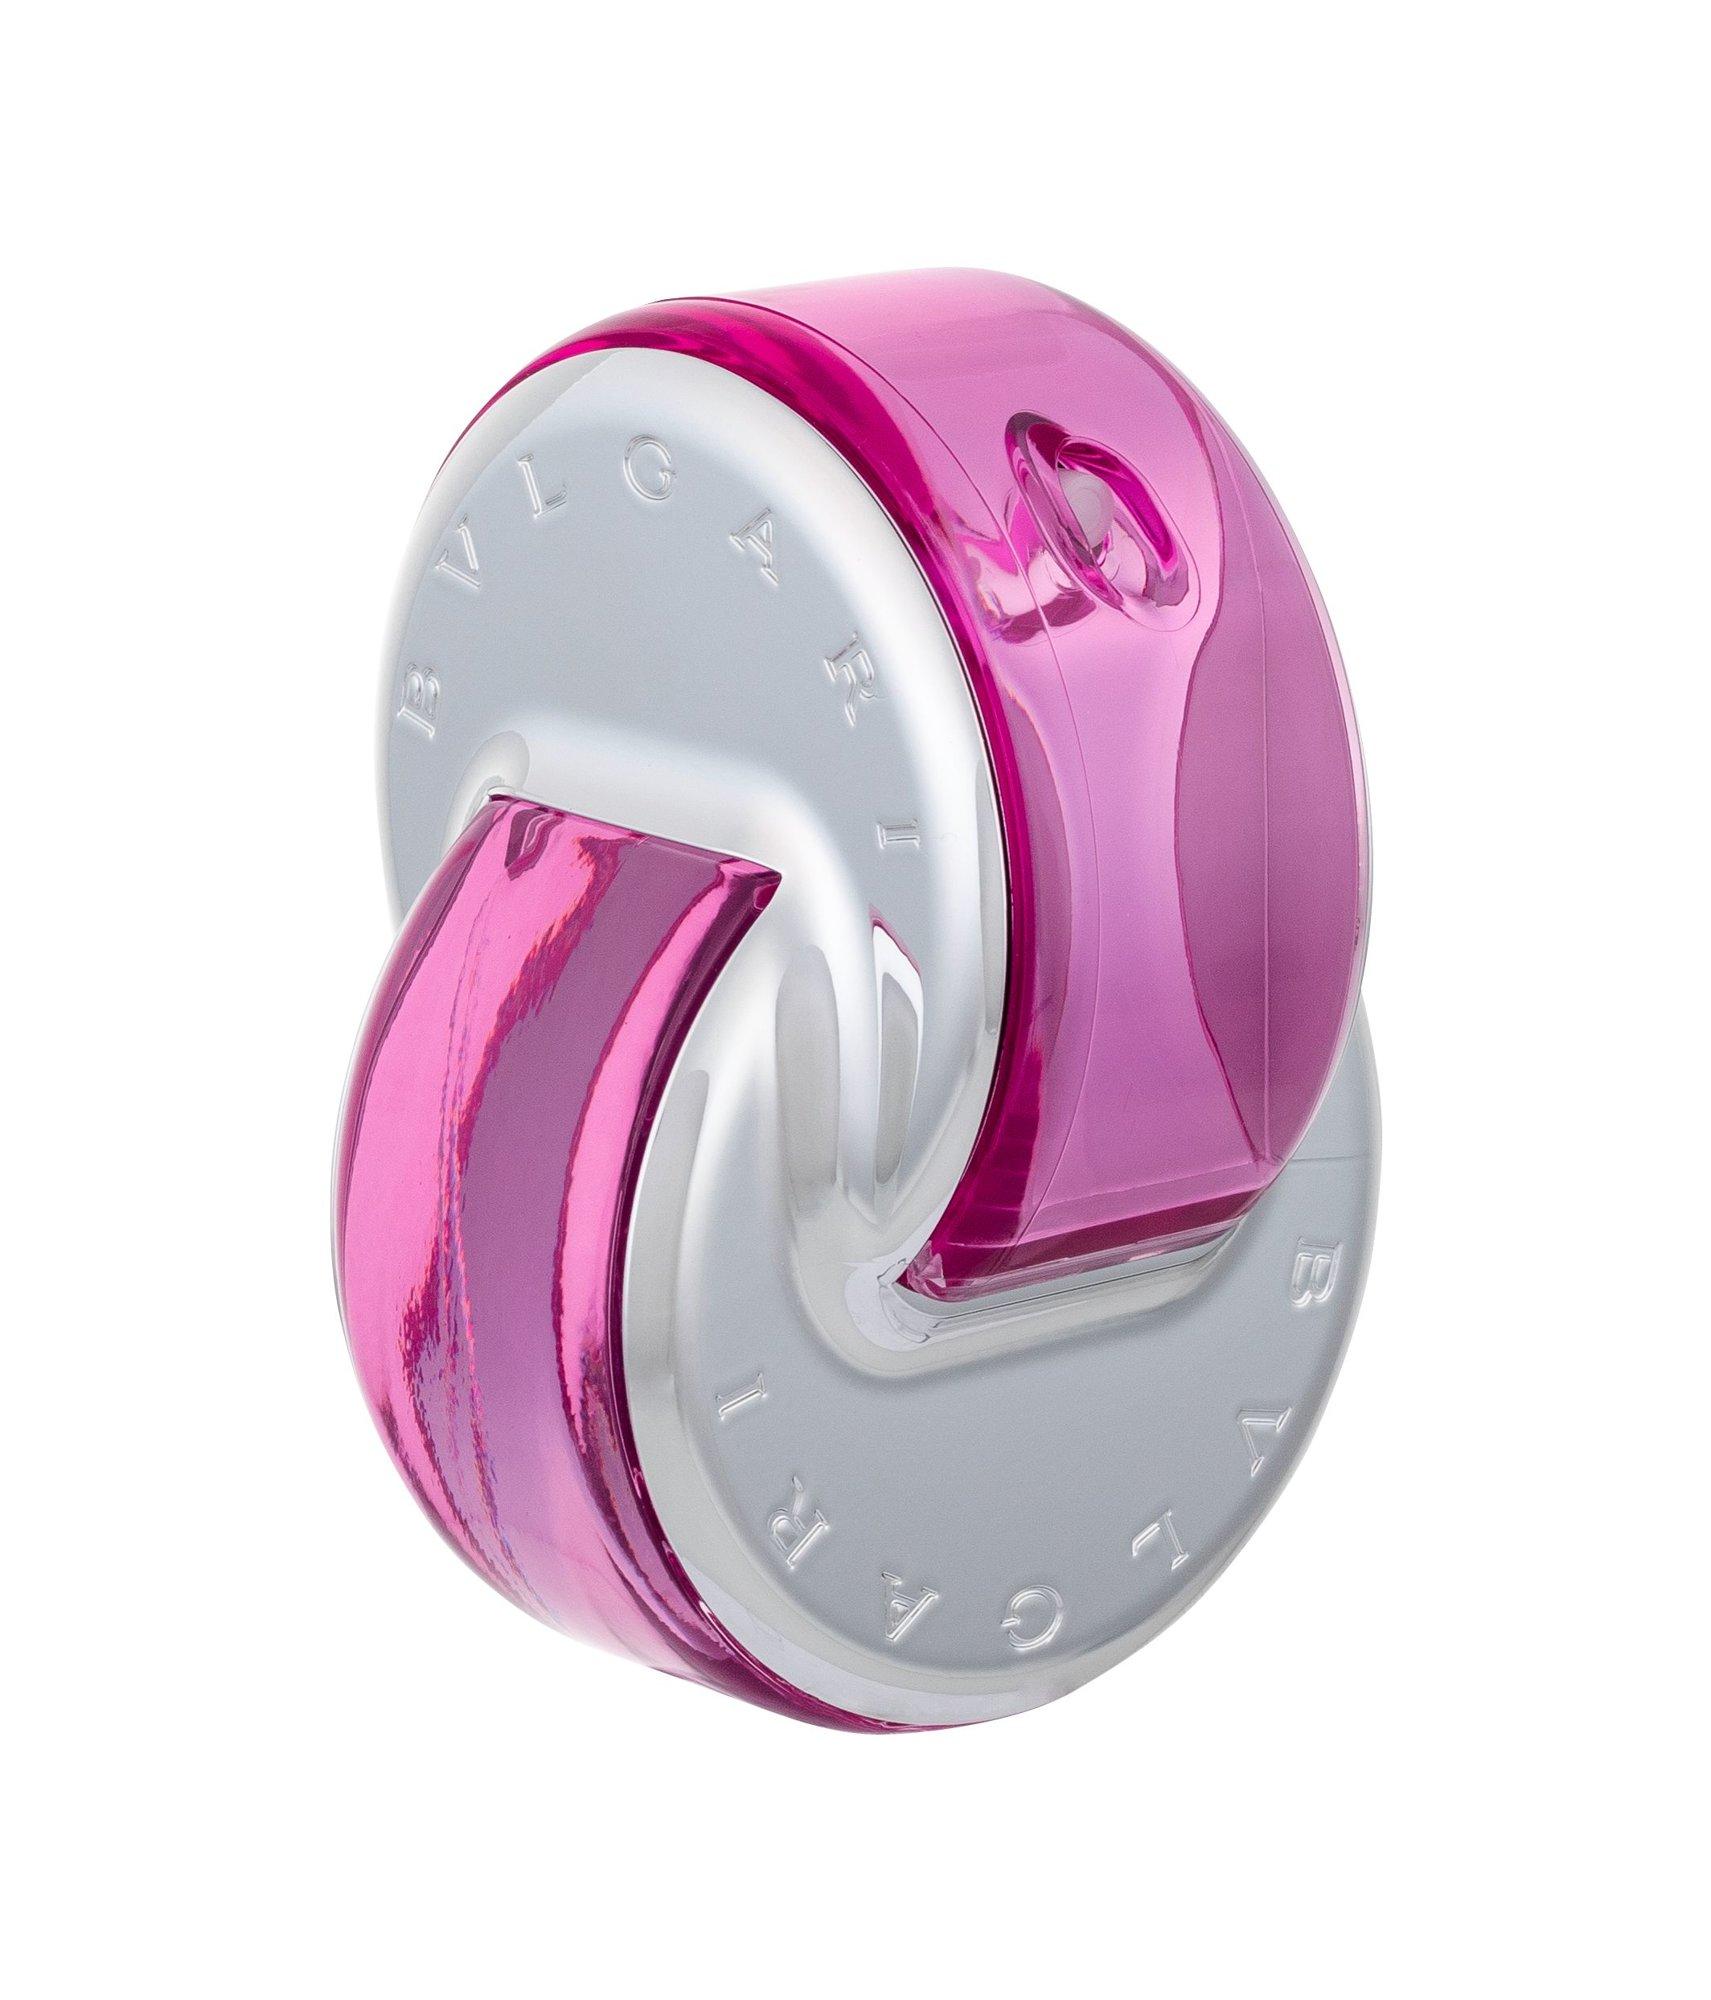 Bvlgari Omnia Pink Sapphire Eau de Toilette 65ml